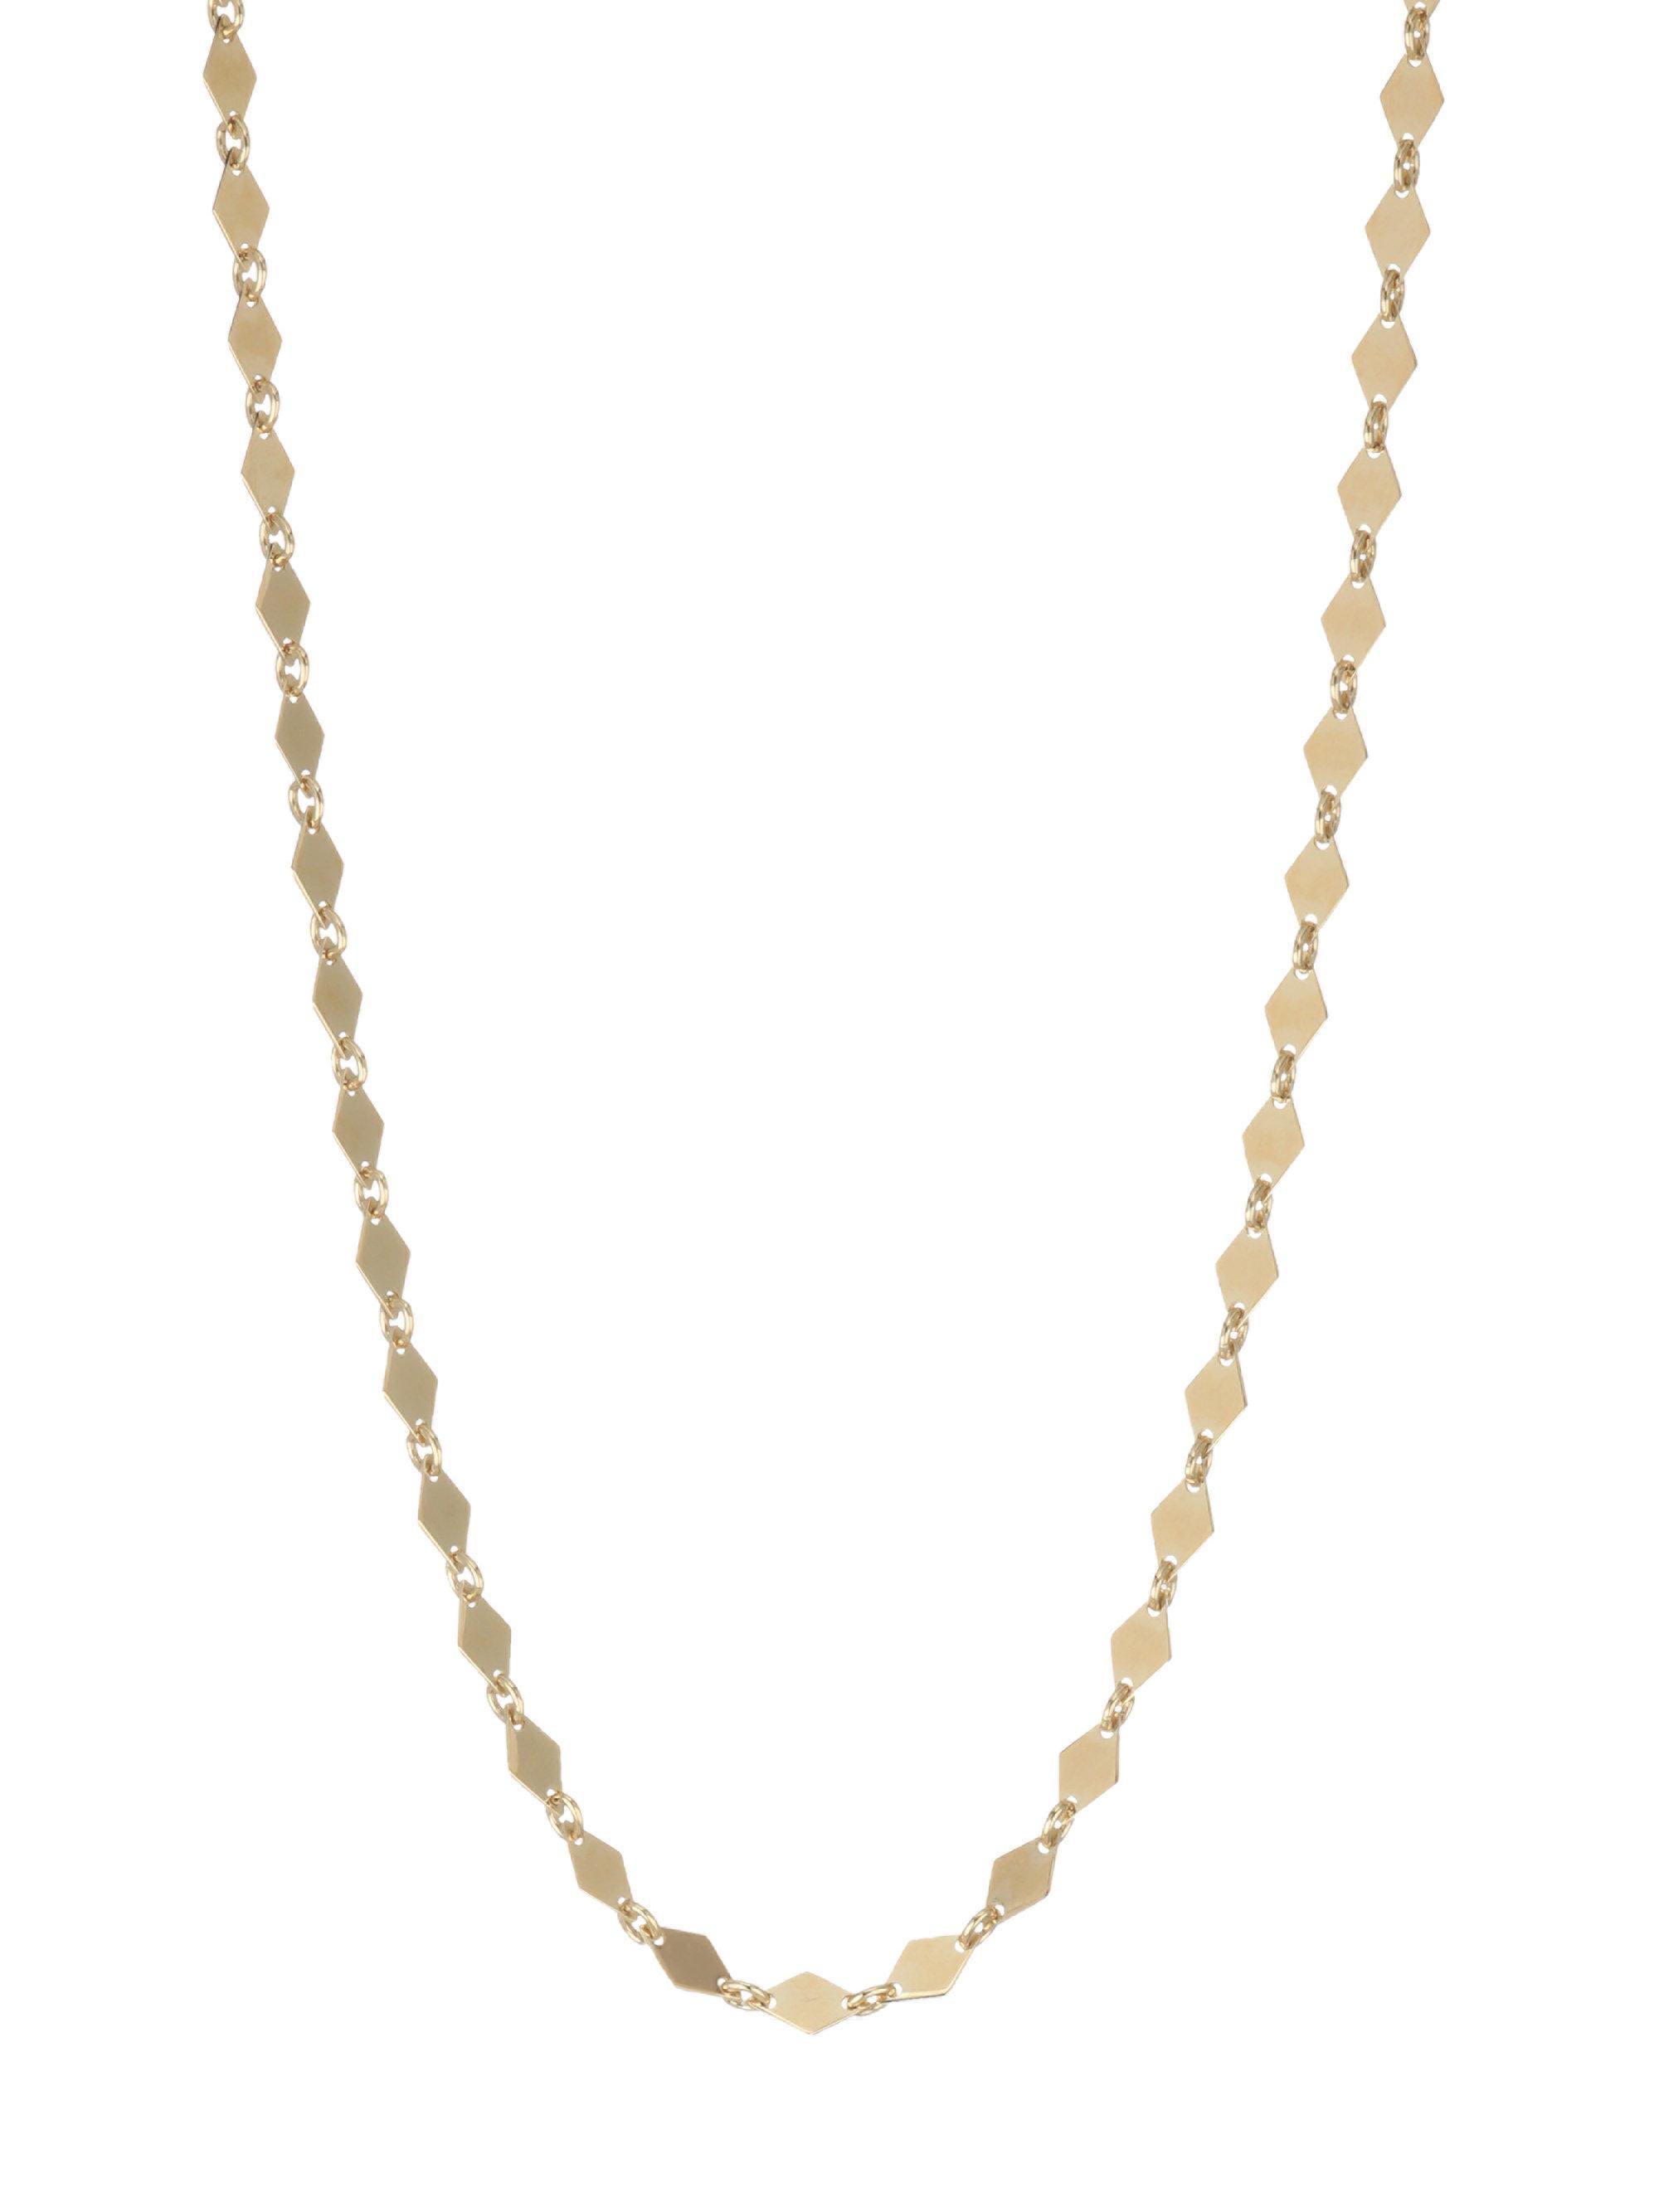 Lana Jewelry 14k Tricolor Gold Triple-Strand Necklace klF9yyg2